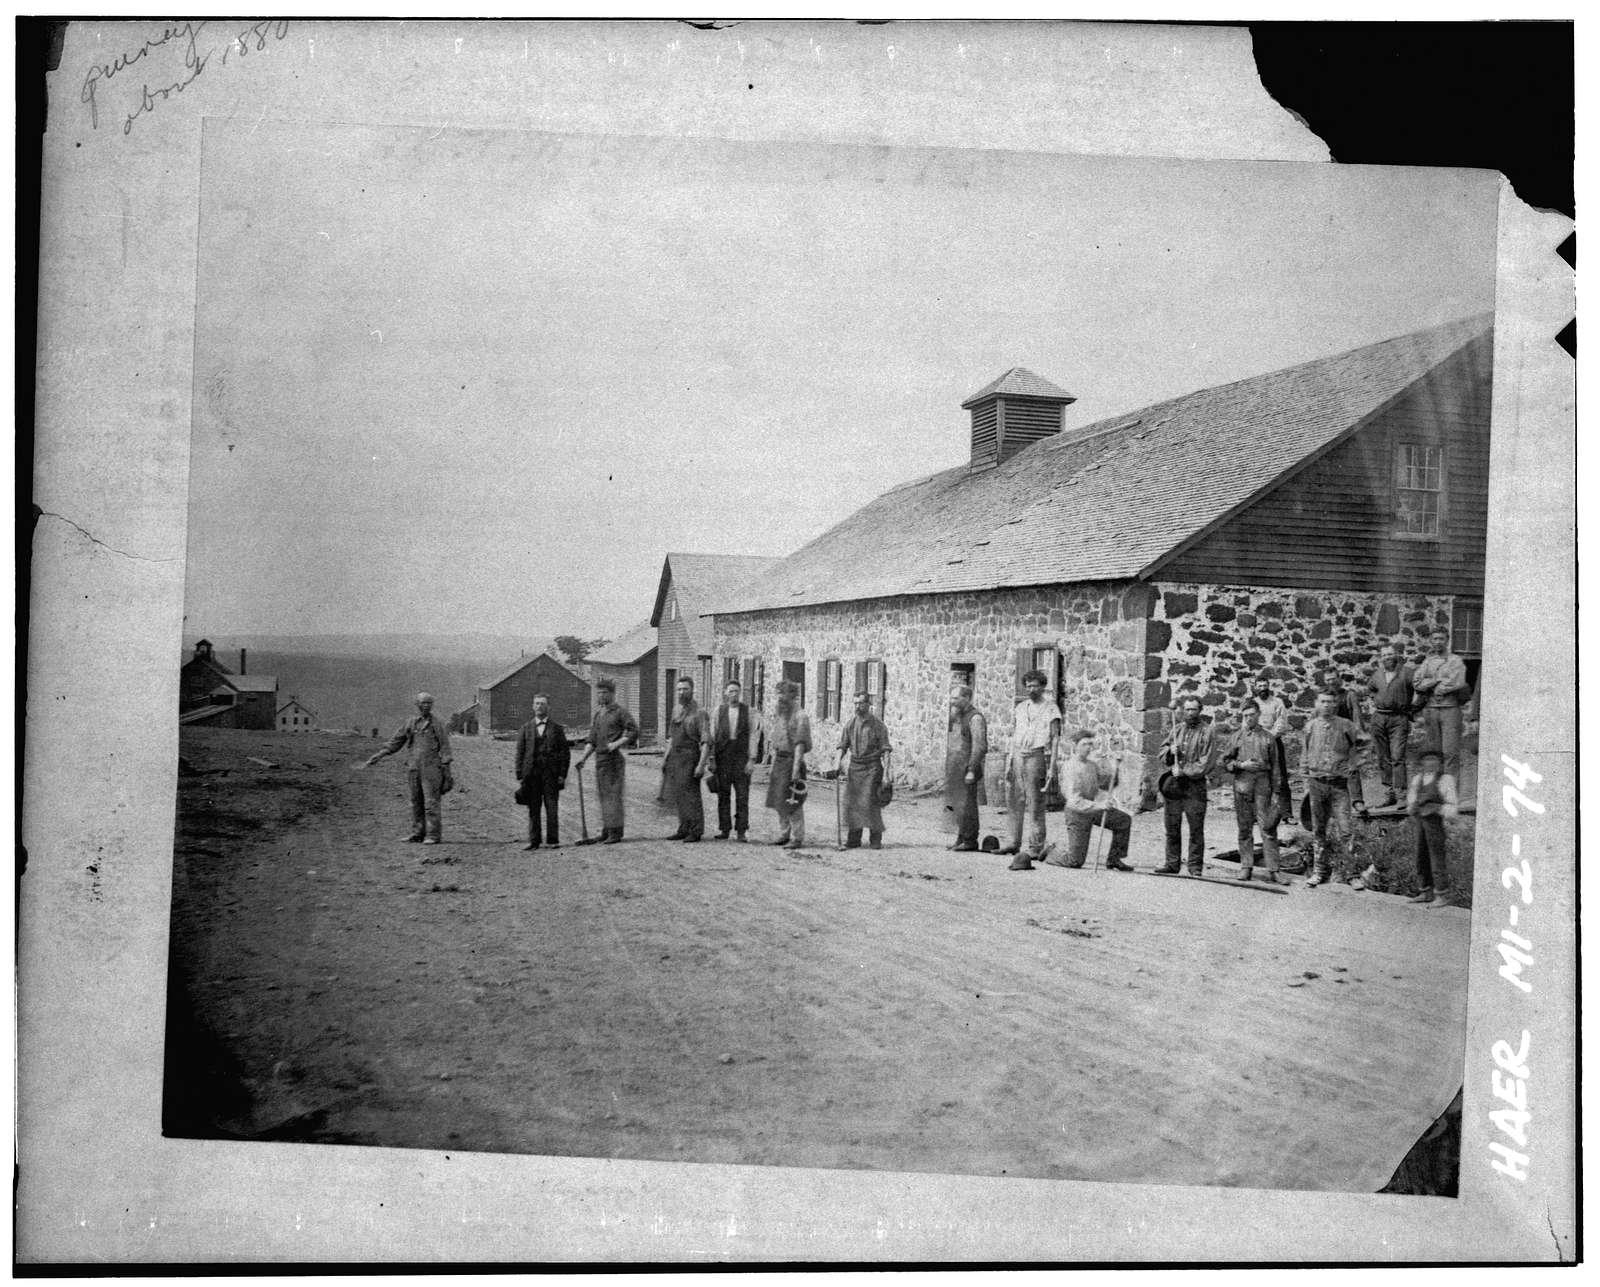 Quincy Mining Company, Hancock, Houghton County, MI